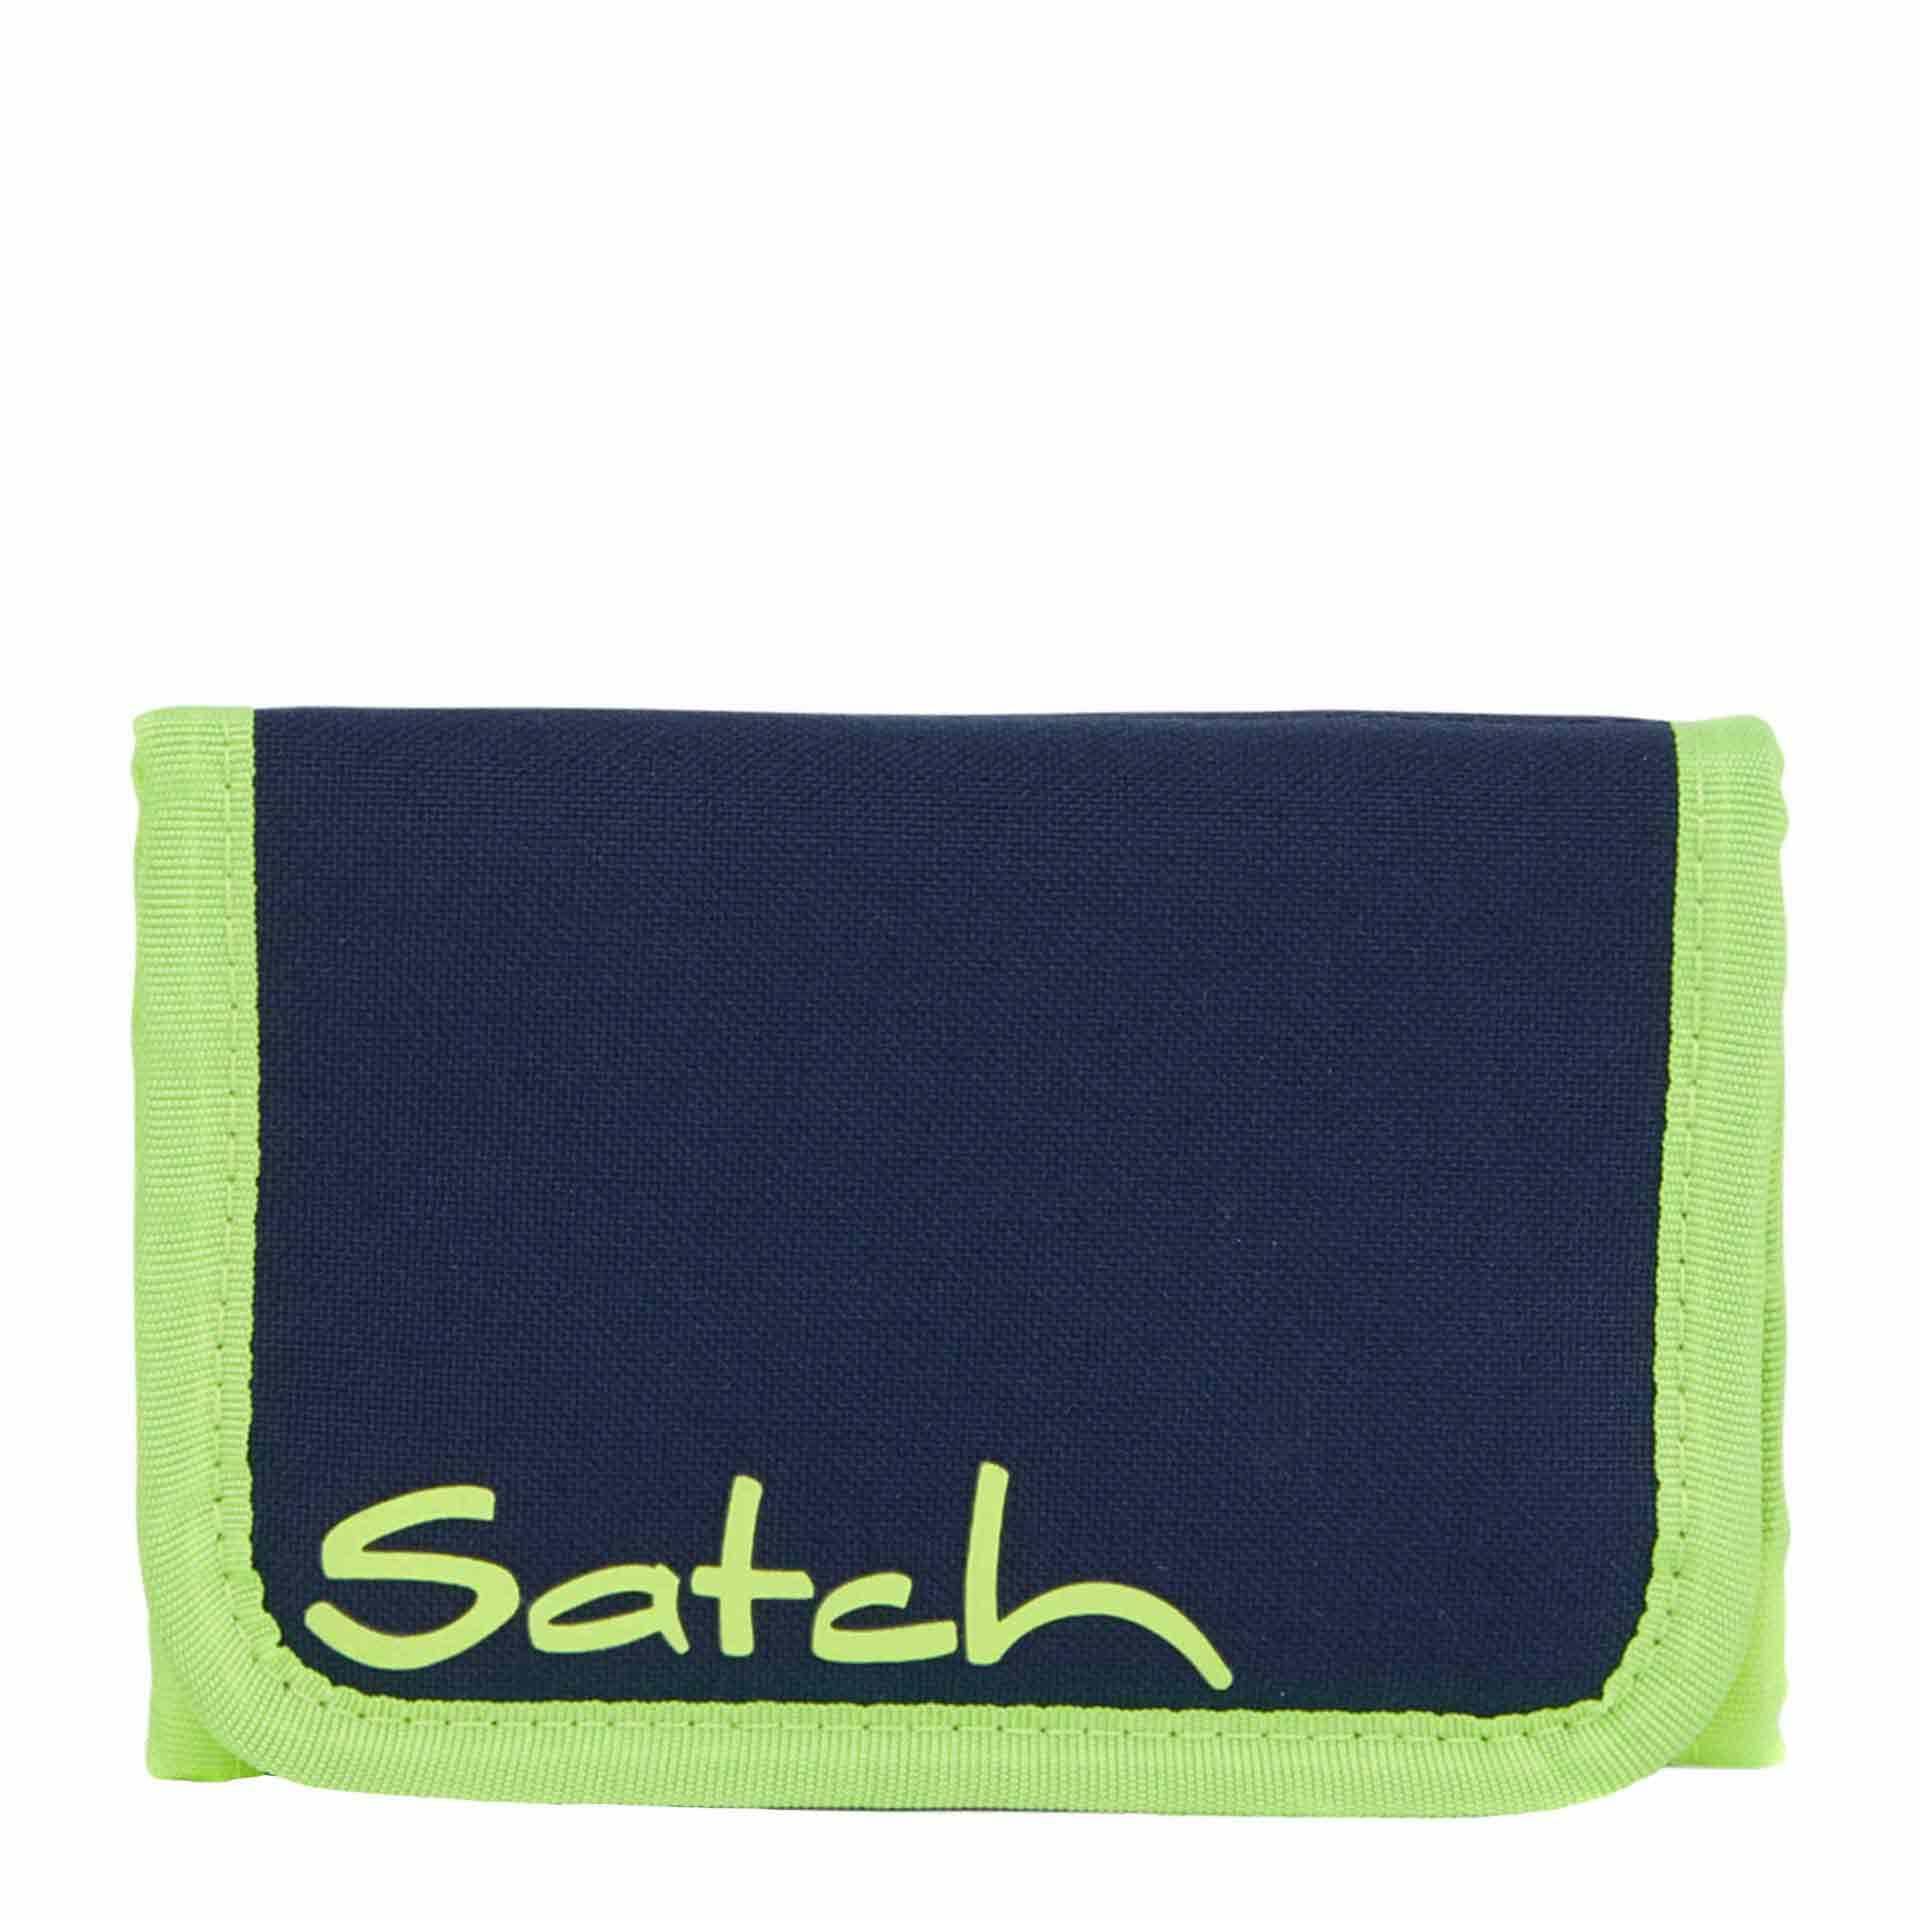 Satch Gelbeutel toxic yellow